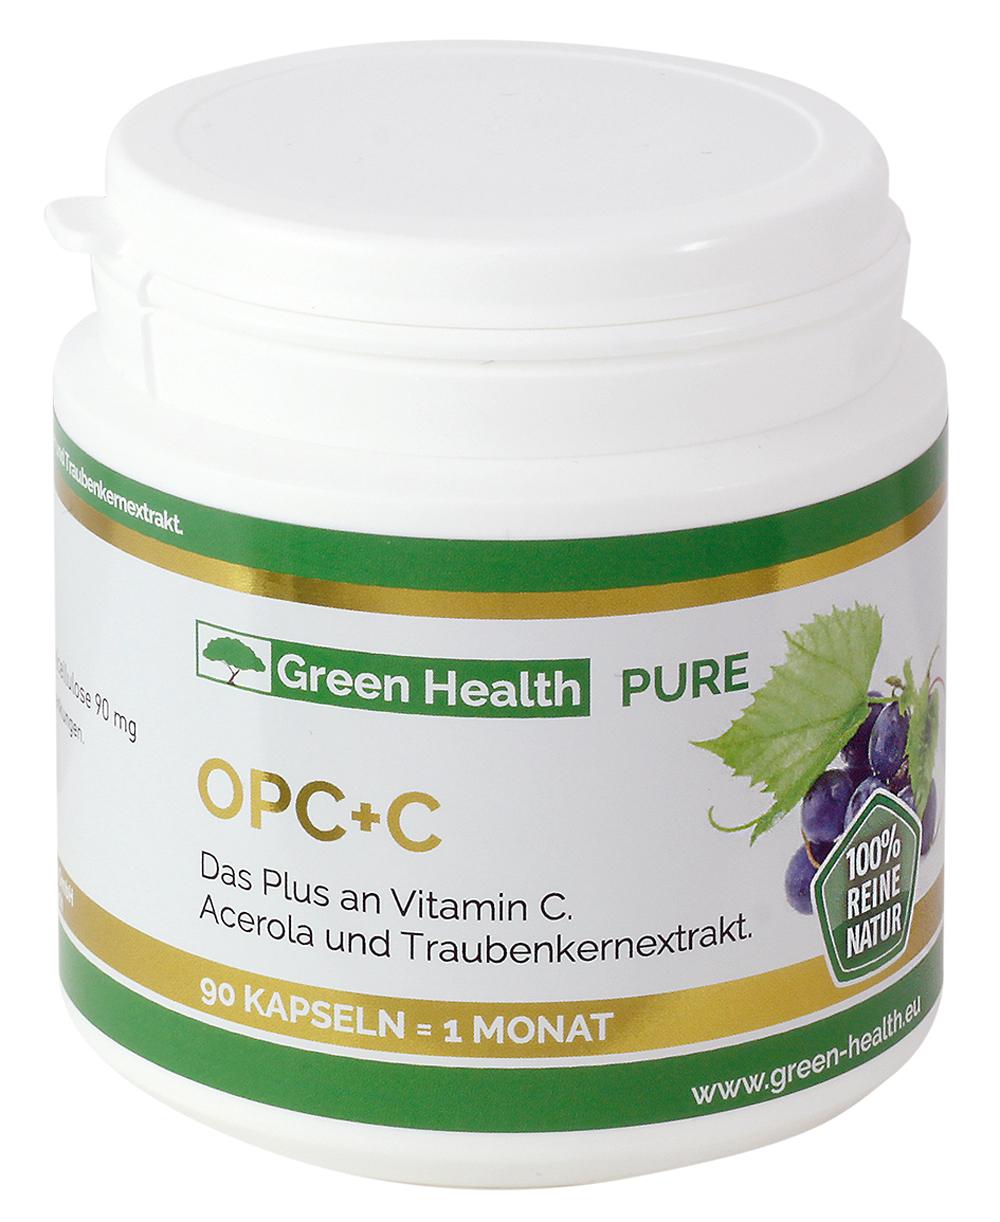 Green Health Pure OPC+C - 90 Kapseln